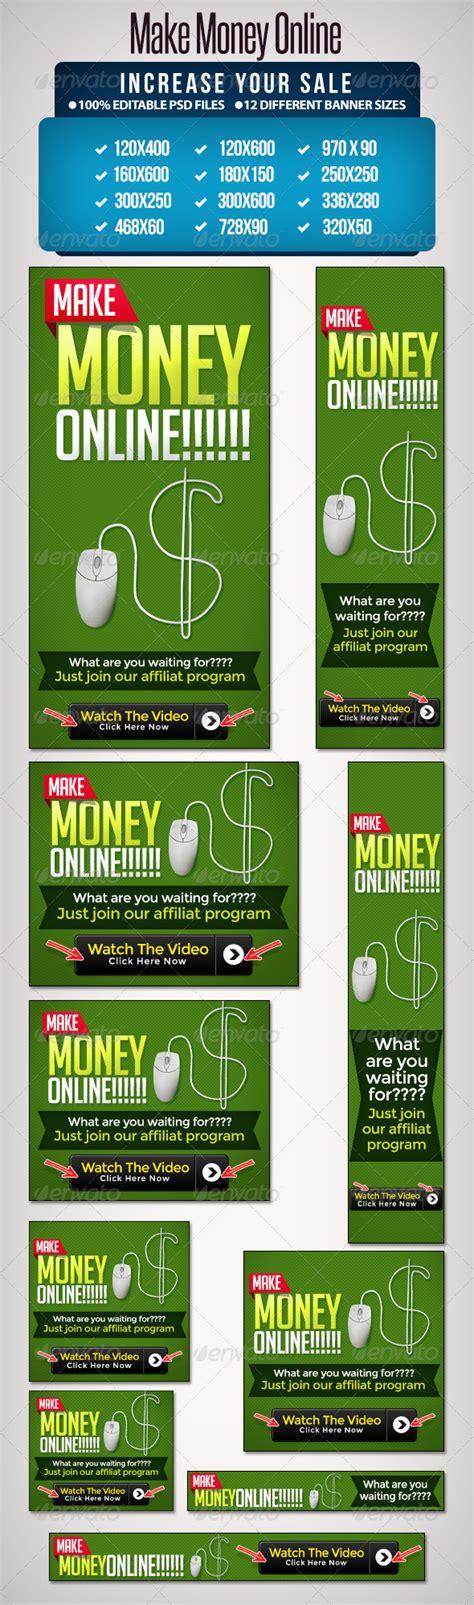 Make Money Online Banner - make money online banner set 12 sizes graphicriver